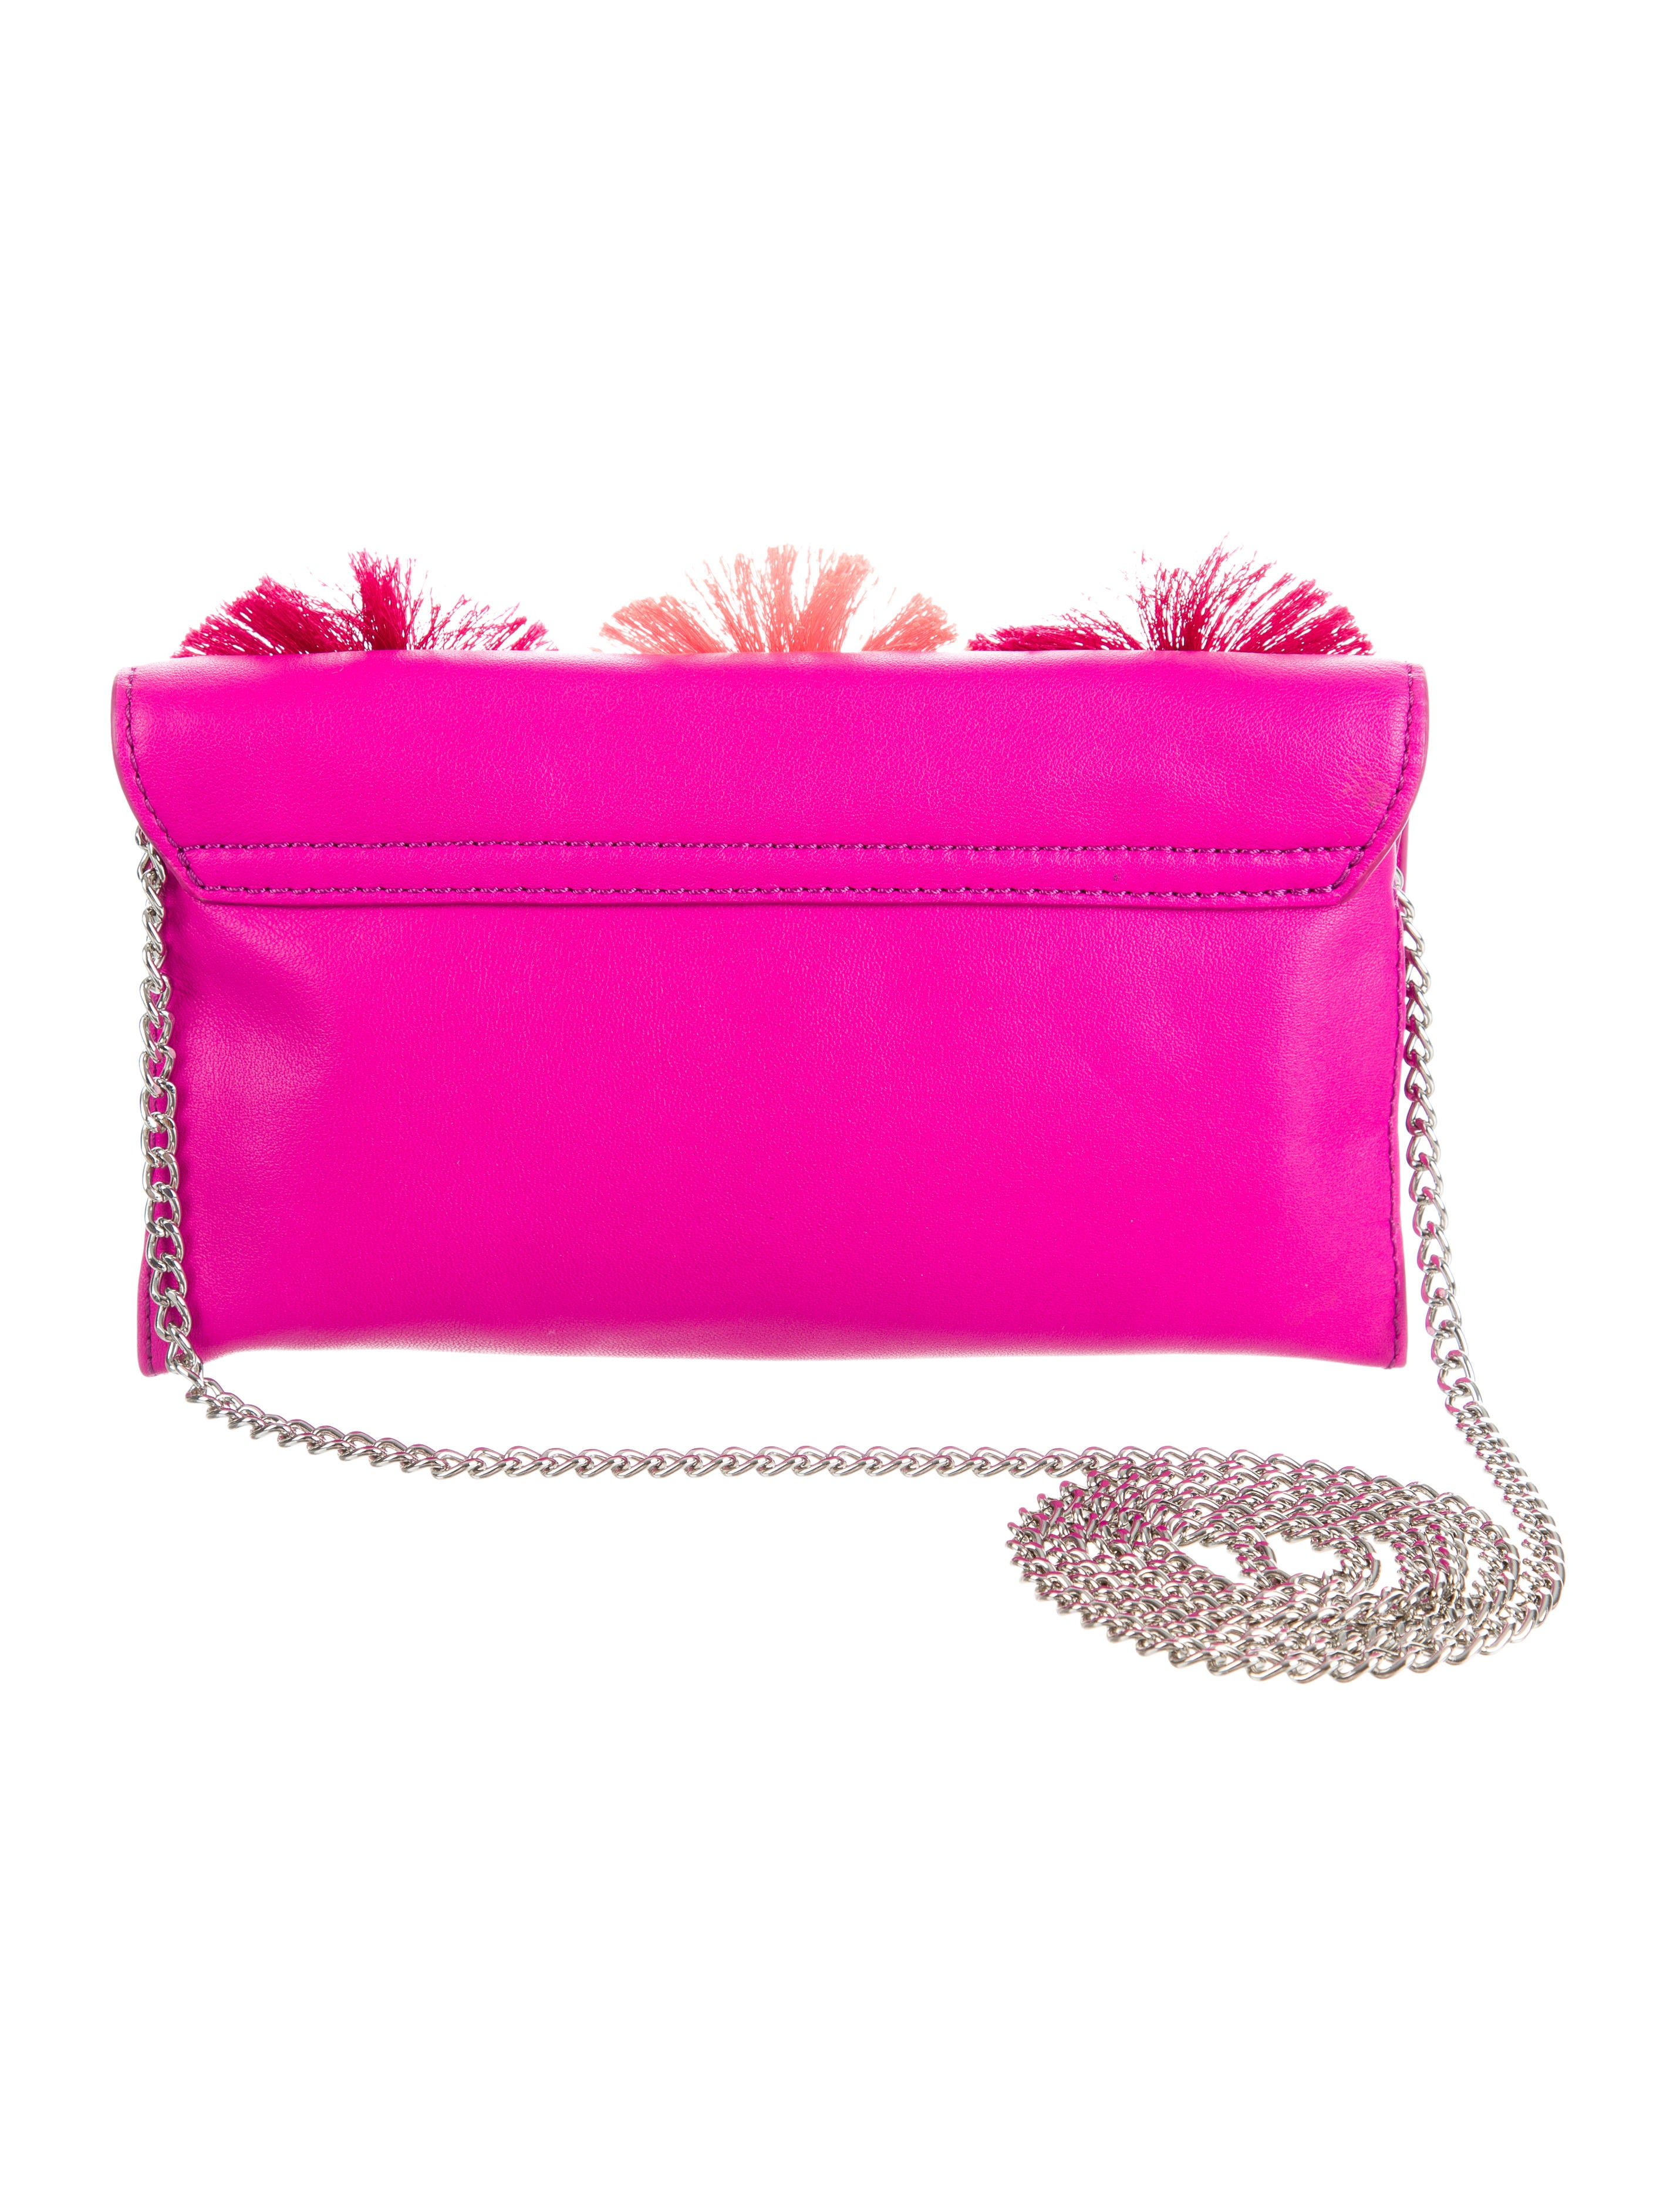 Loeffler Randall Floral Embellished Crossbody Bag - Handbags - WLF26247 | The RealReal